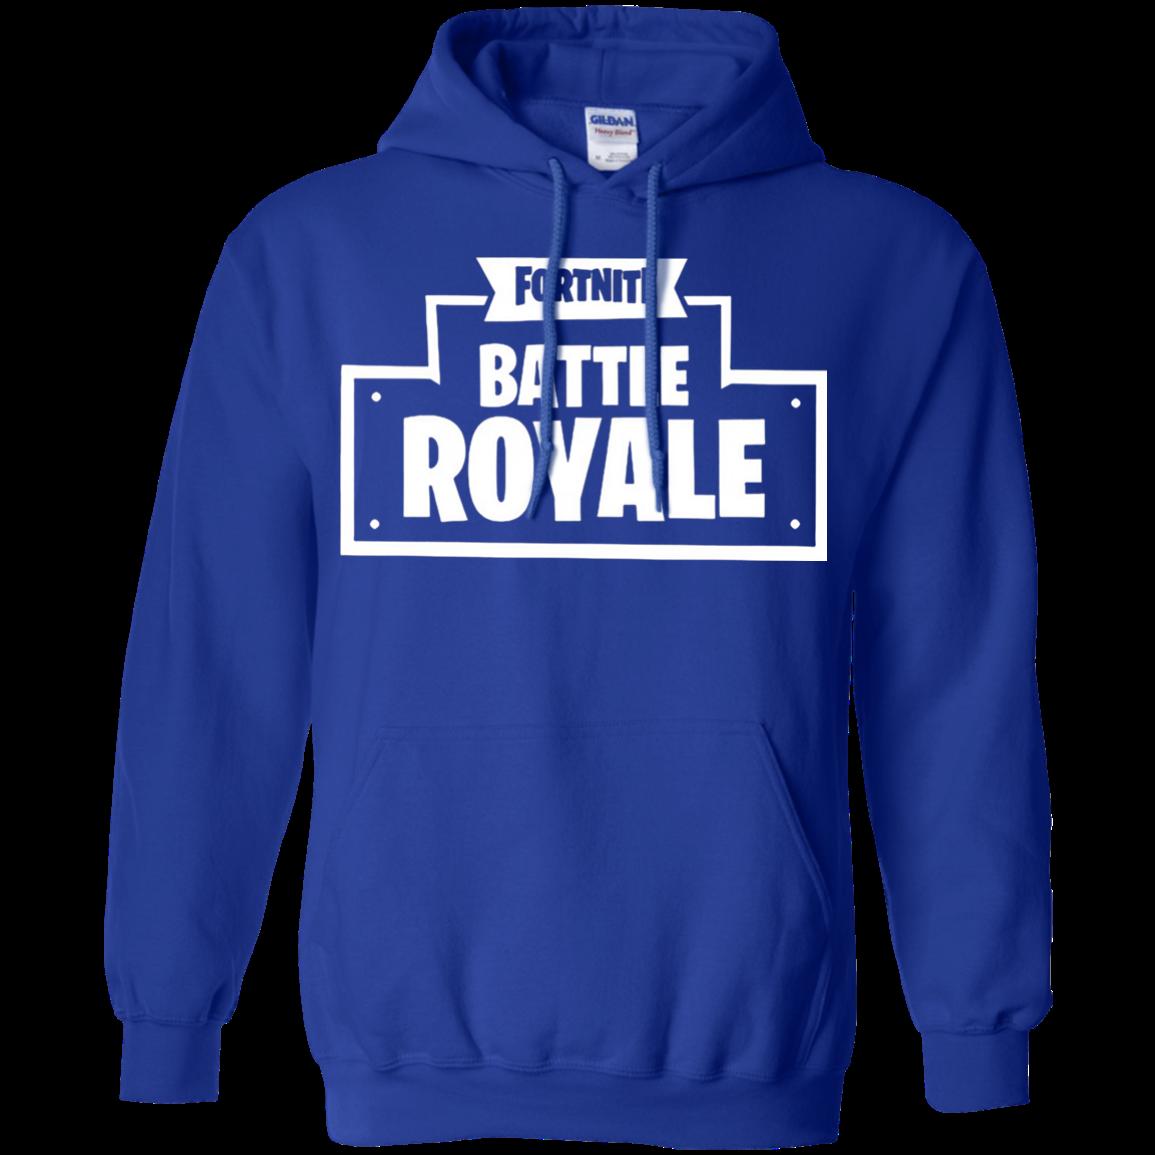 Fortnite battle royale t. Hoodie clipart winter sweater